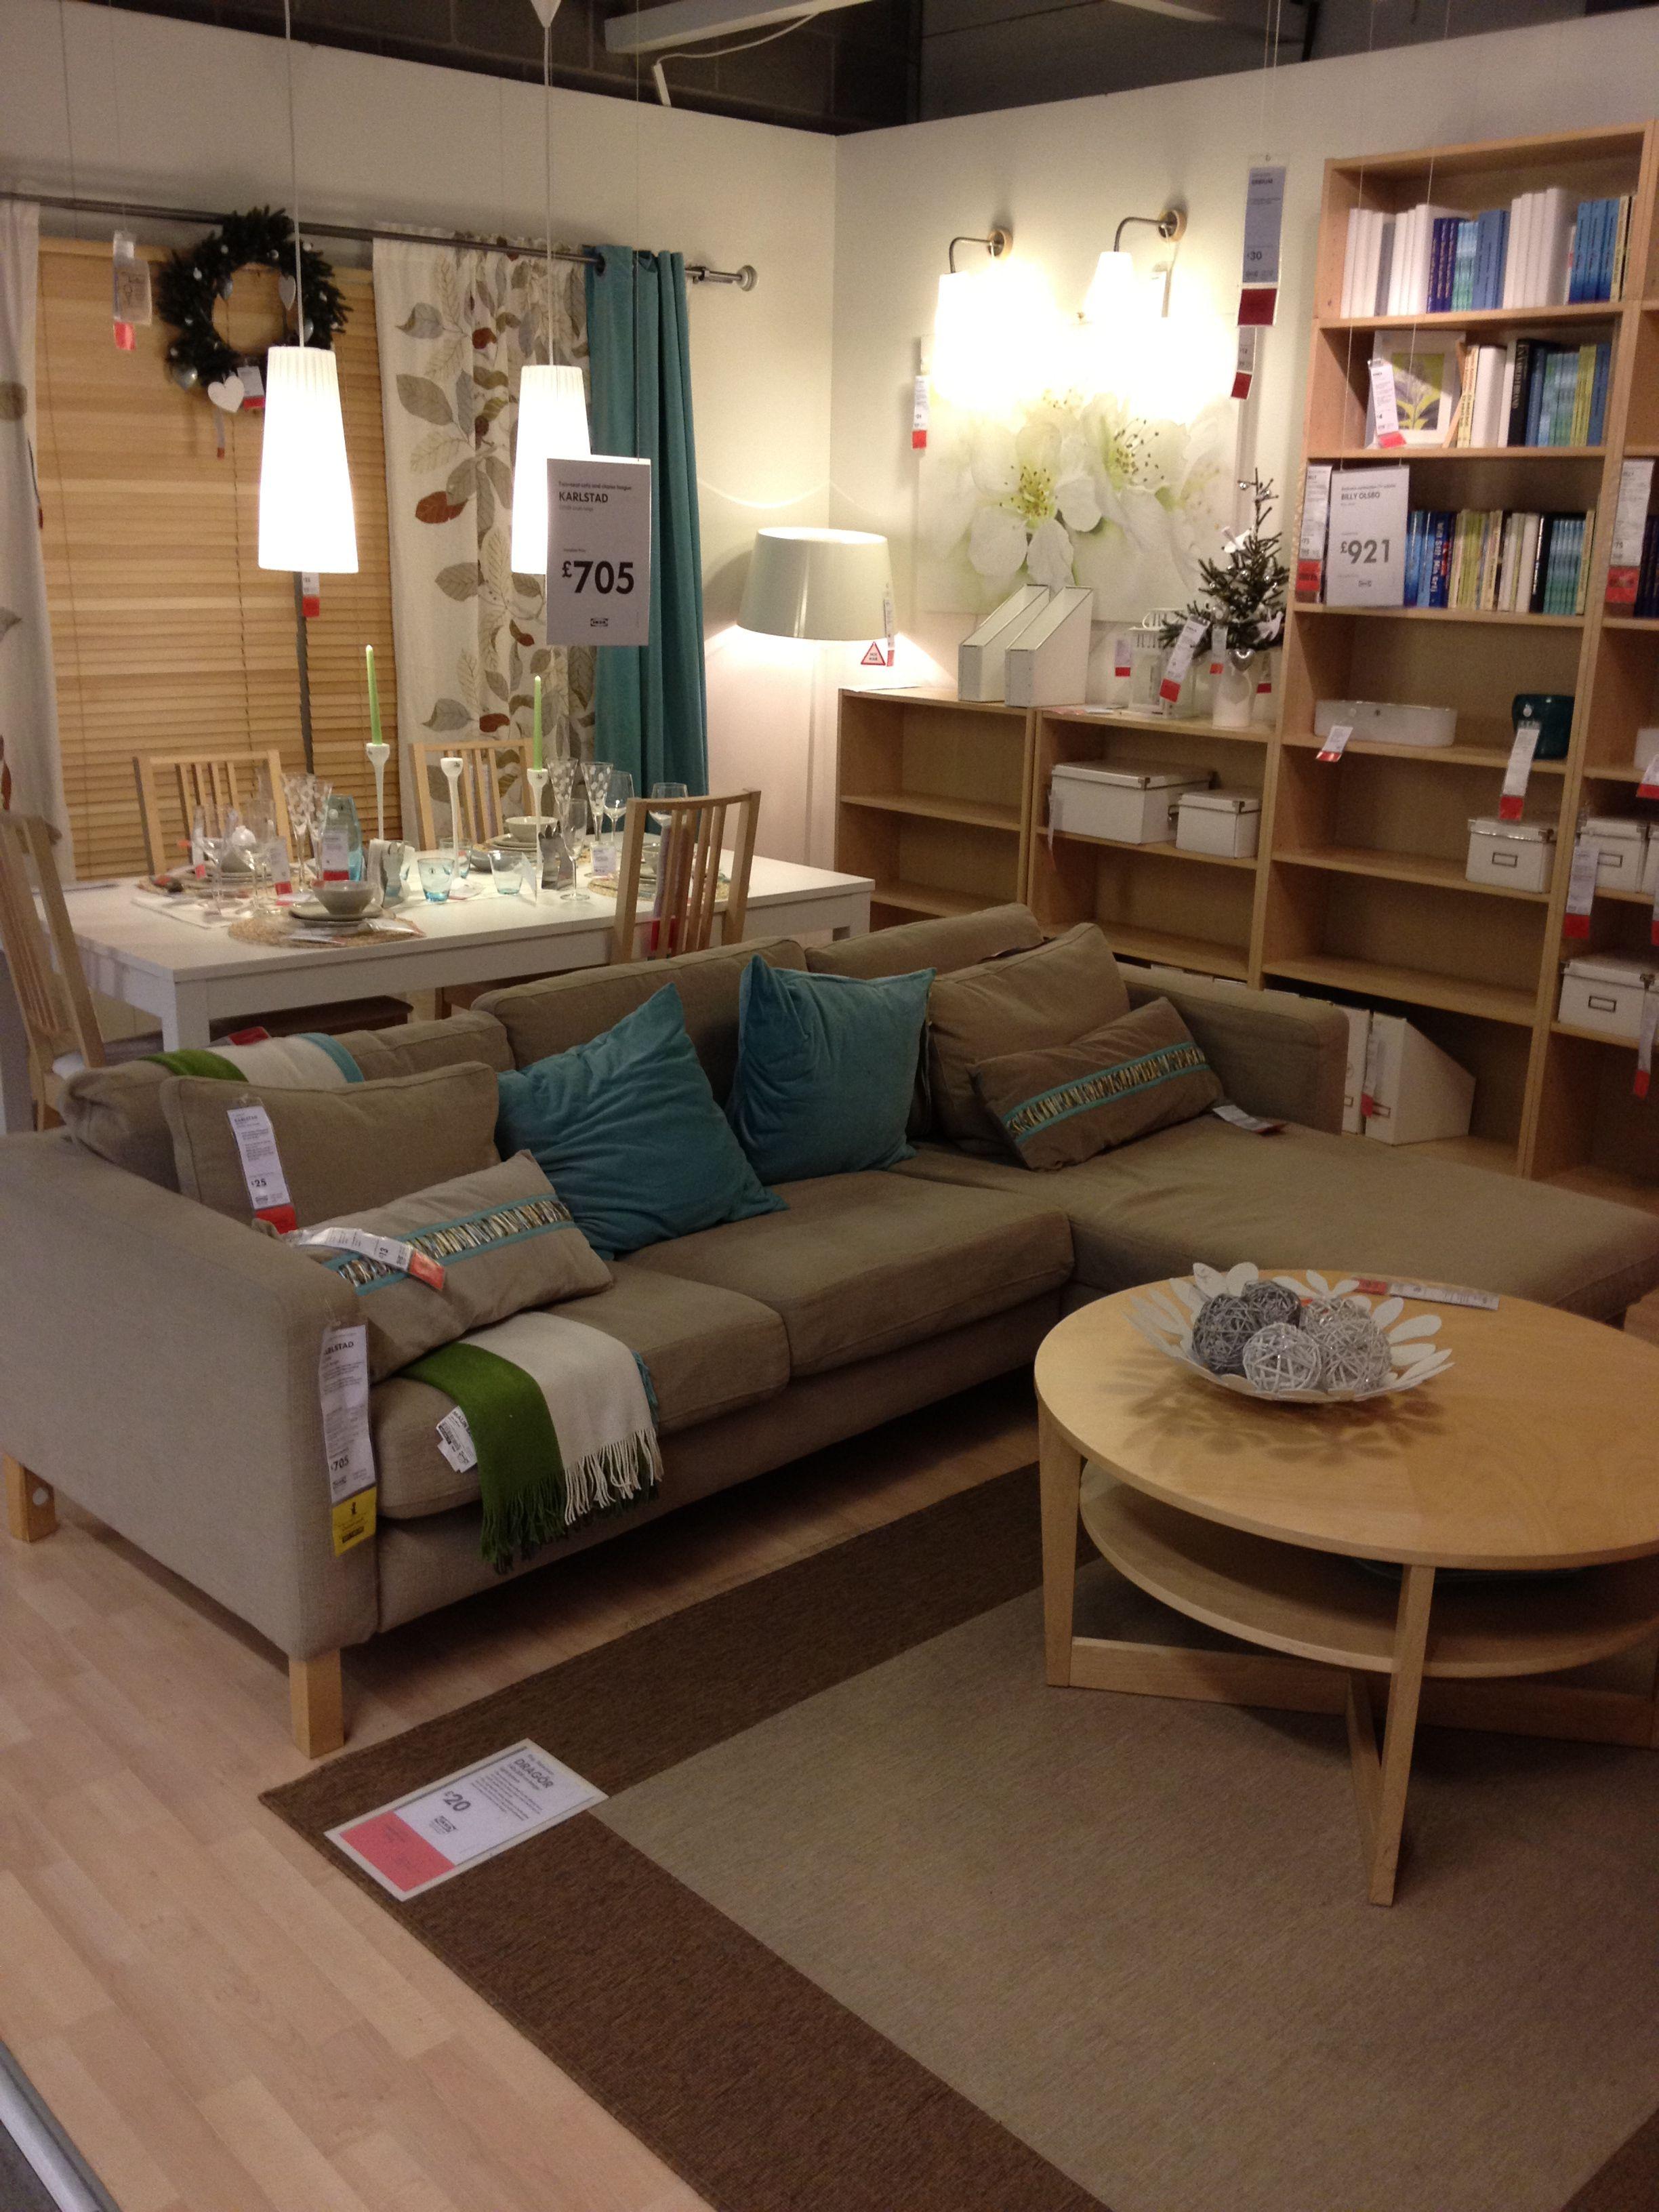 Ikea Showroom Living Room Pinterest Ikea Showroom Showroom And Scandinavian Style